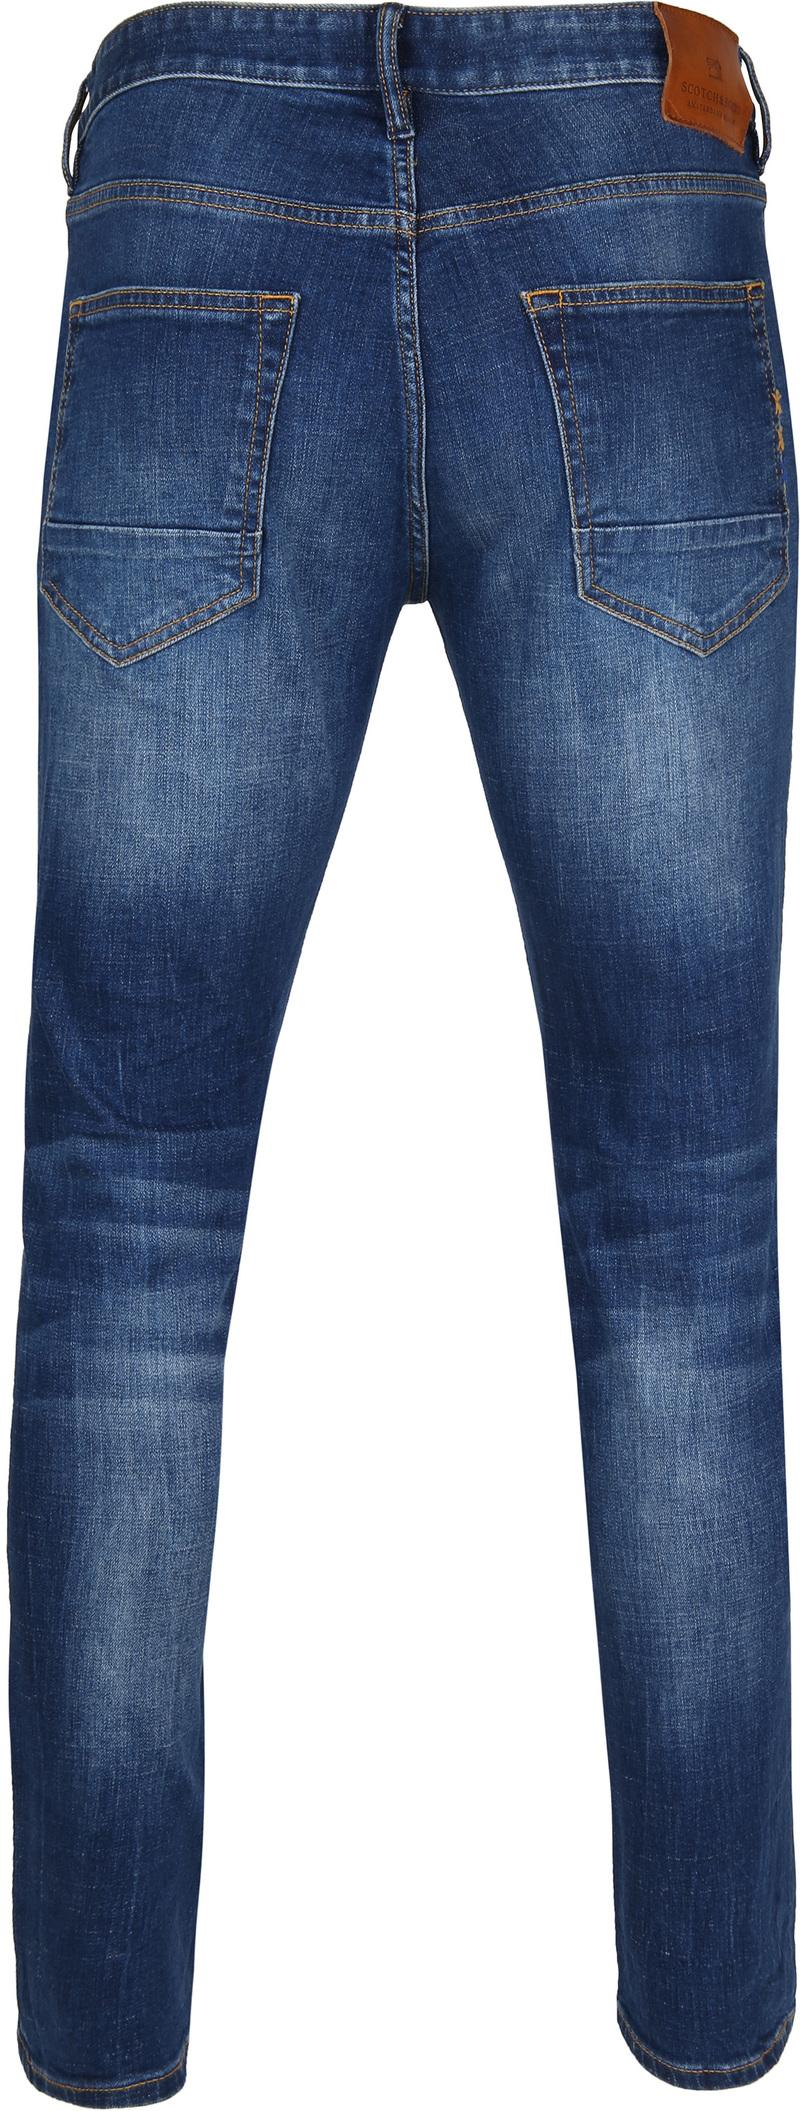 Scotch and Soda Skim Jeans Blauw - Blauw maat W 32 - L 32